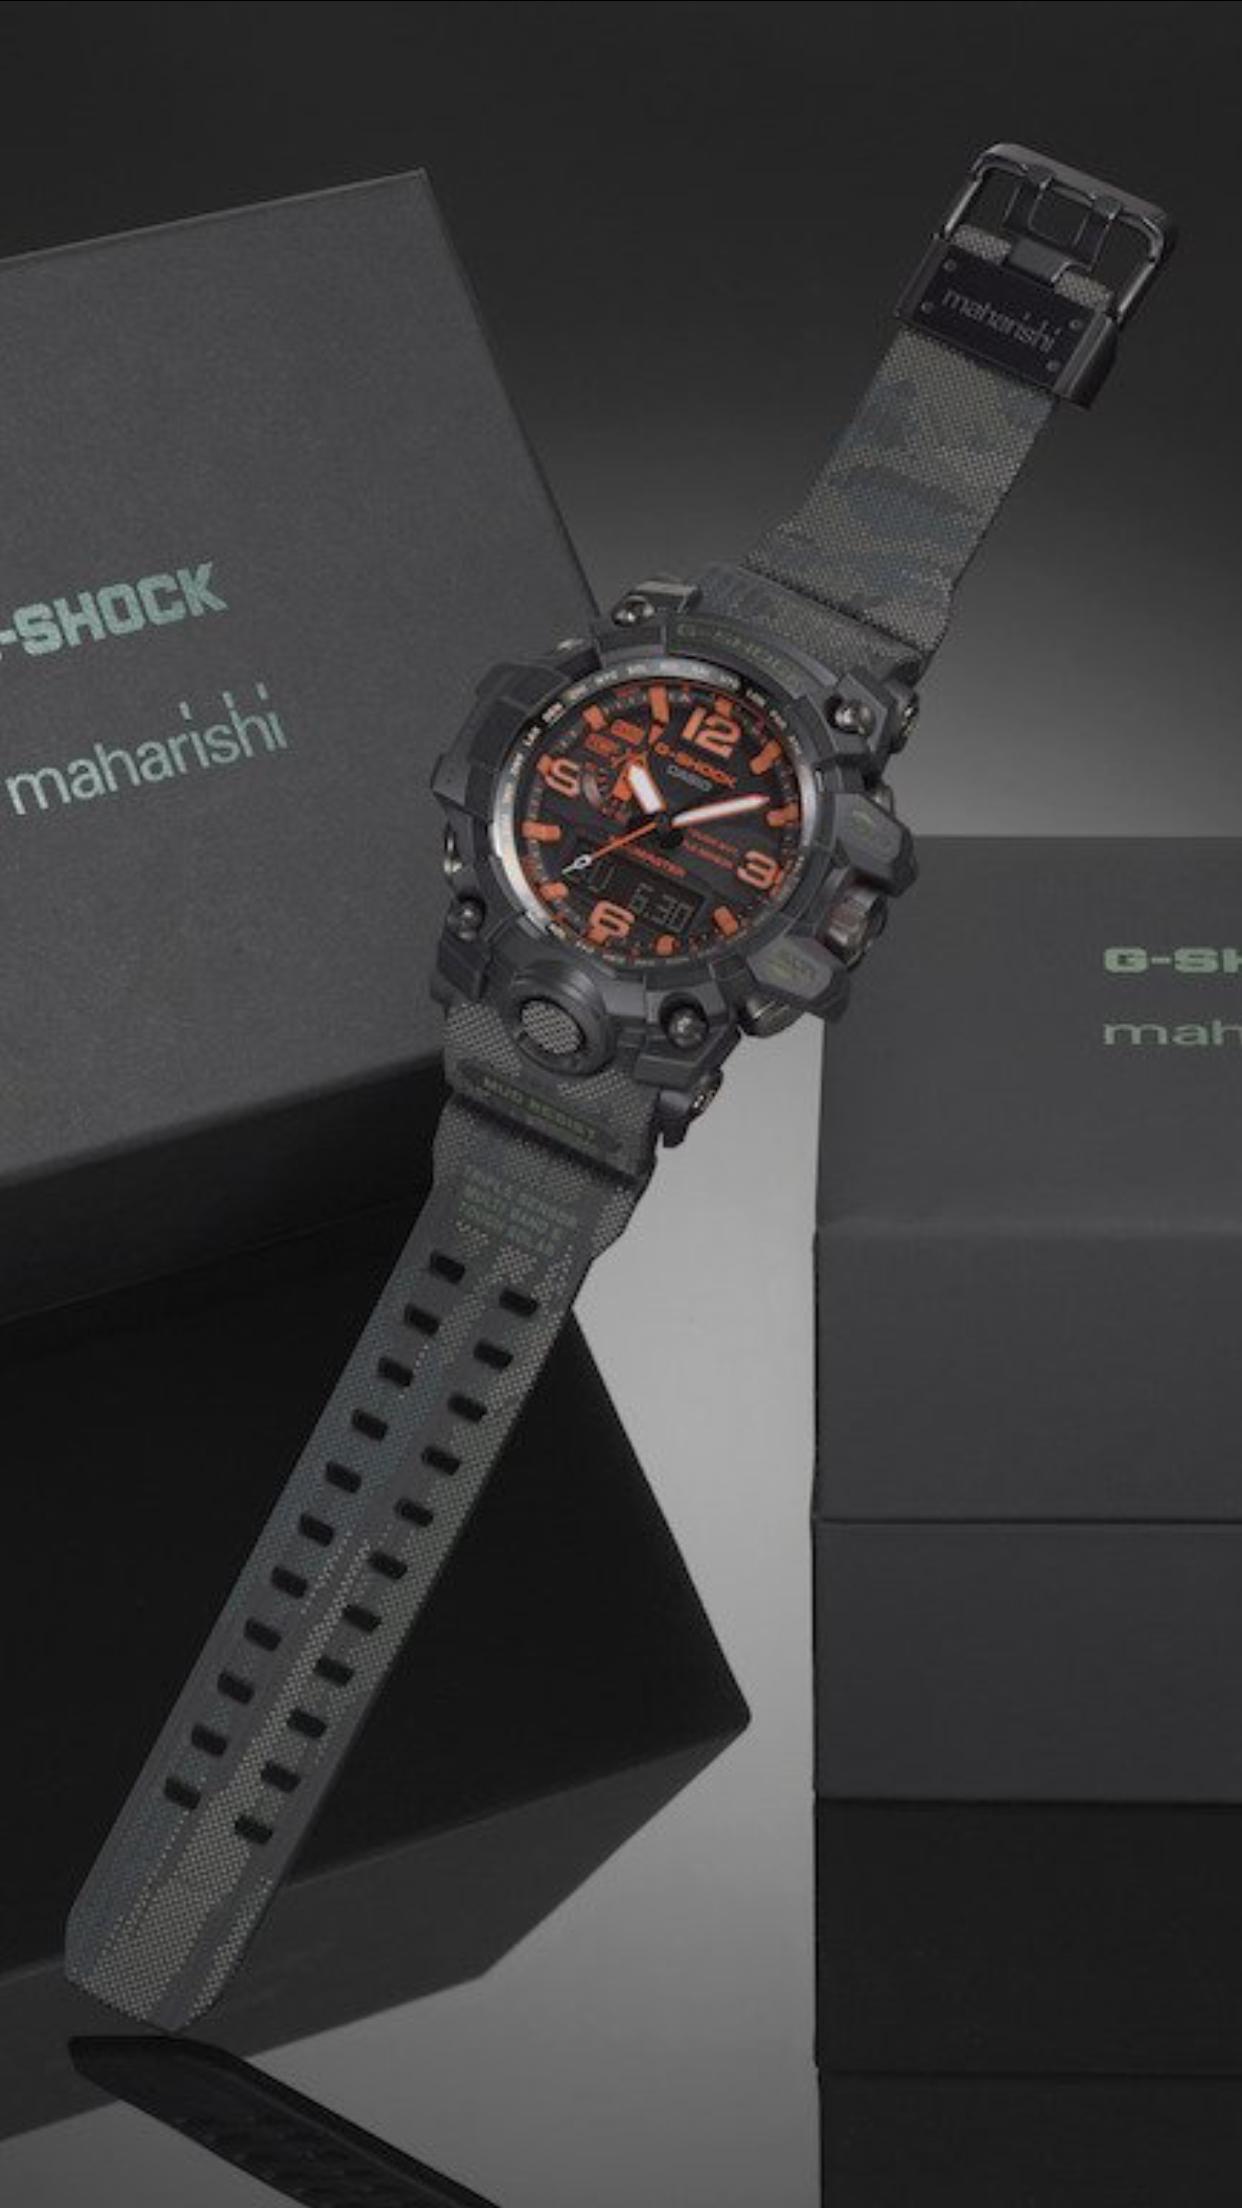 Casio G Shock Mudmaster Maharishi My Time In 2018 Pinterest Gshock Original Gd 100ms 3er Limited Colorway